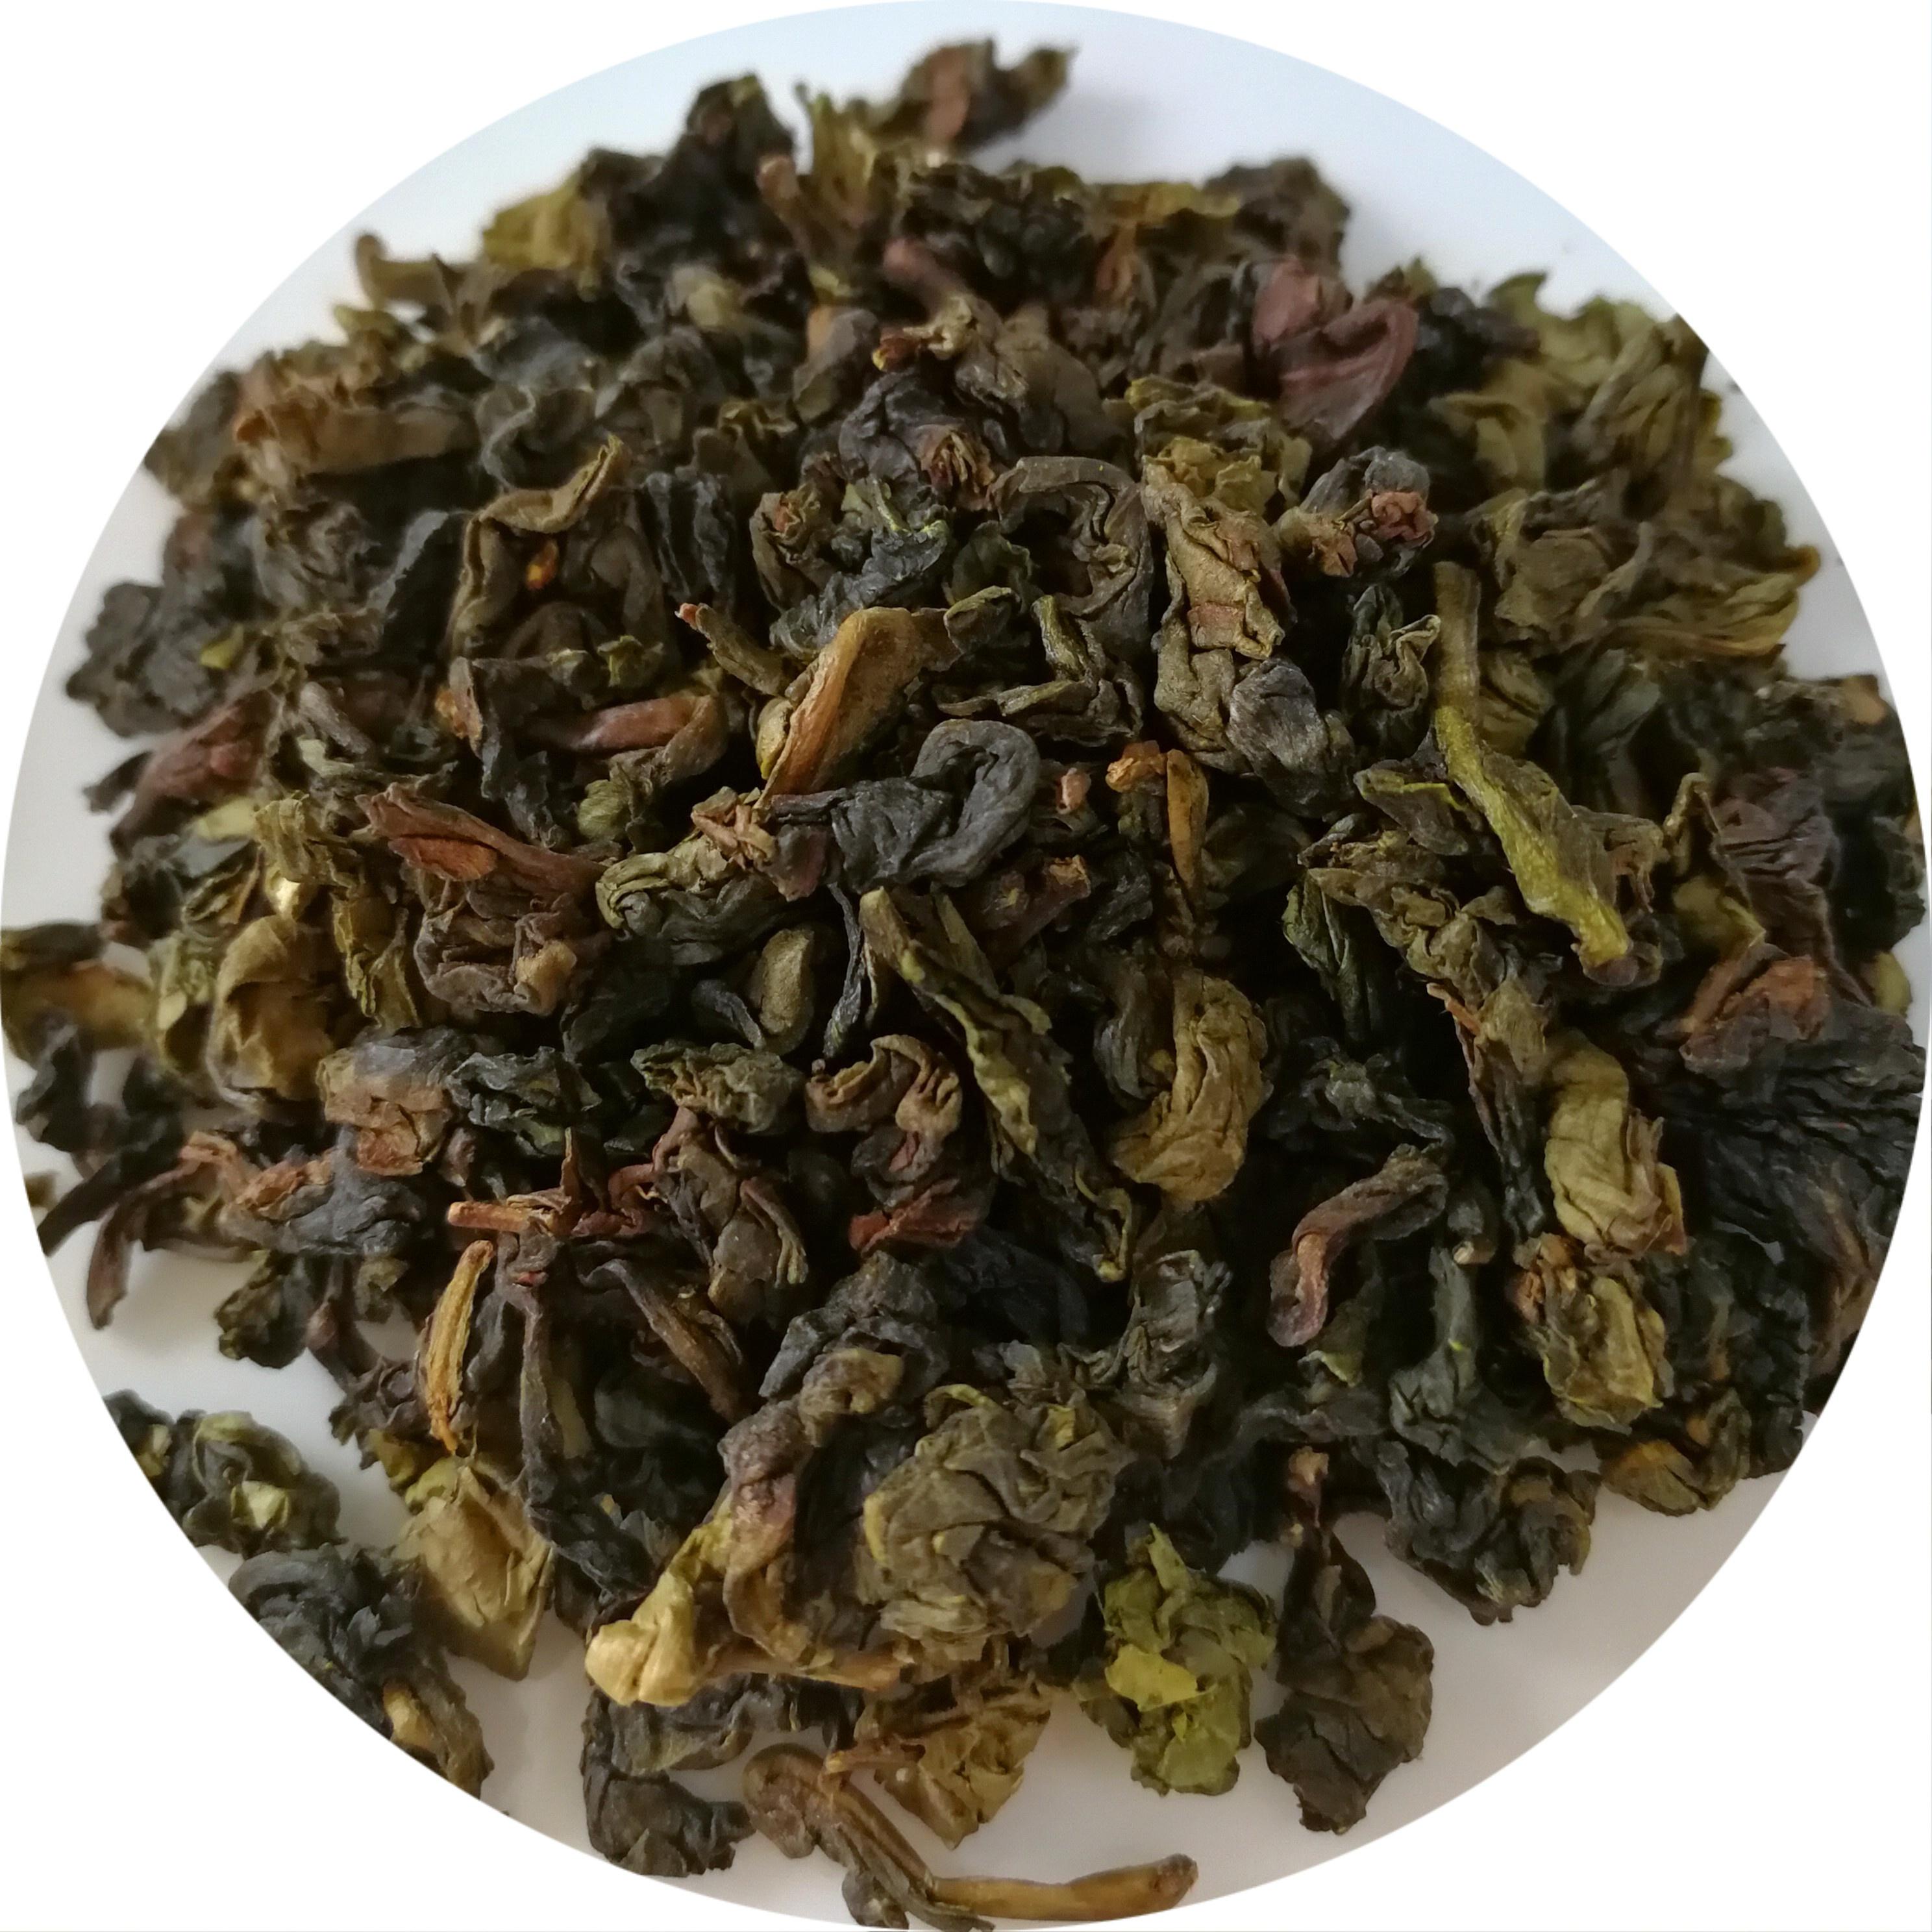 Black Dragon Oolong Tea Leaves High Quality Metabolism Oolong Loose Tea Leaf Dragon Eye Oolong Tea - 4uTea | 4uTea.com